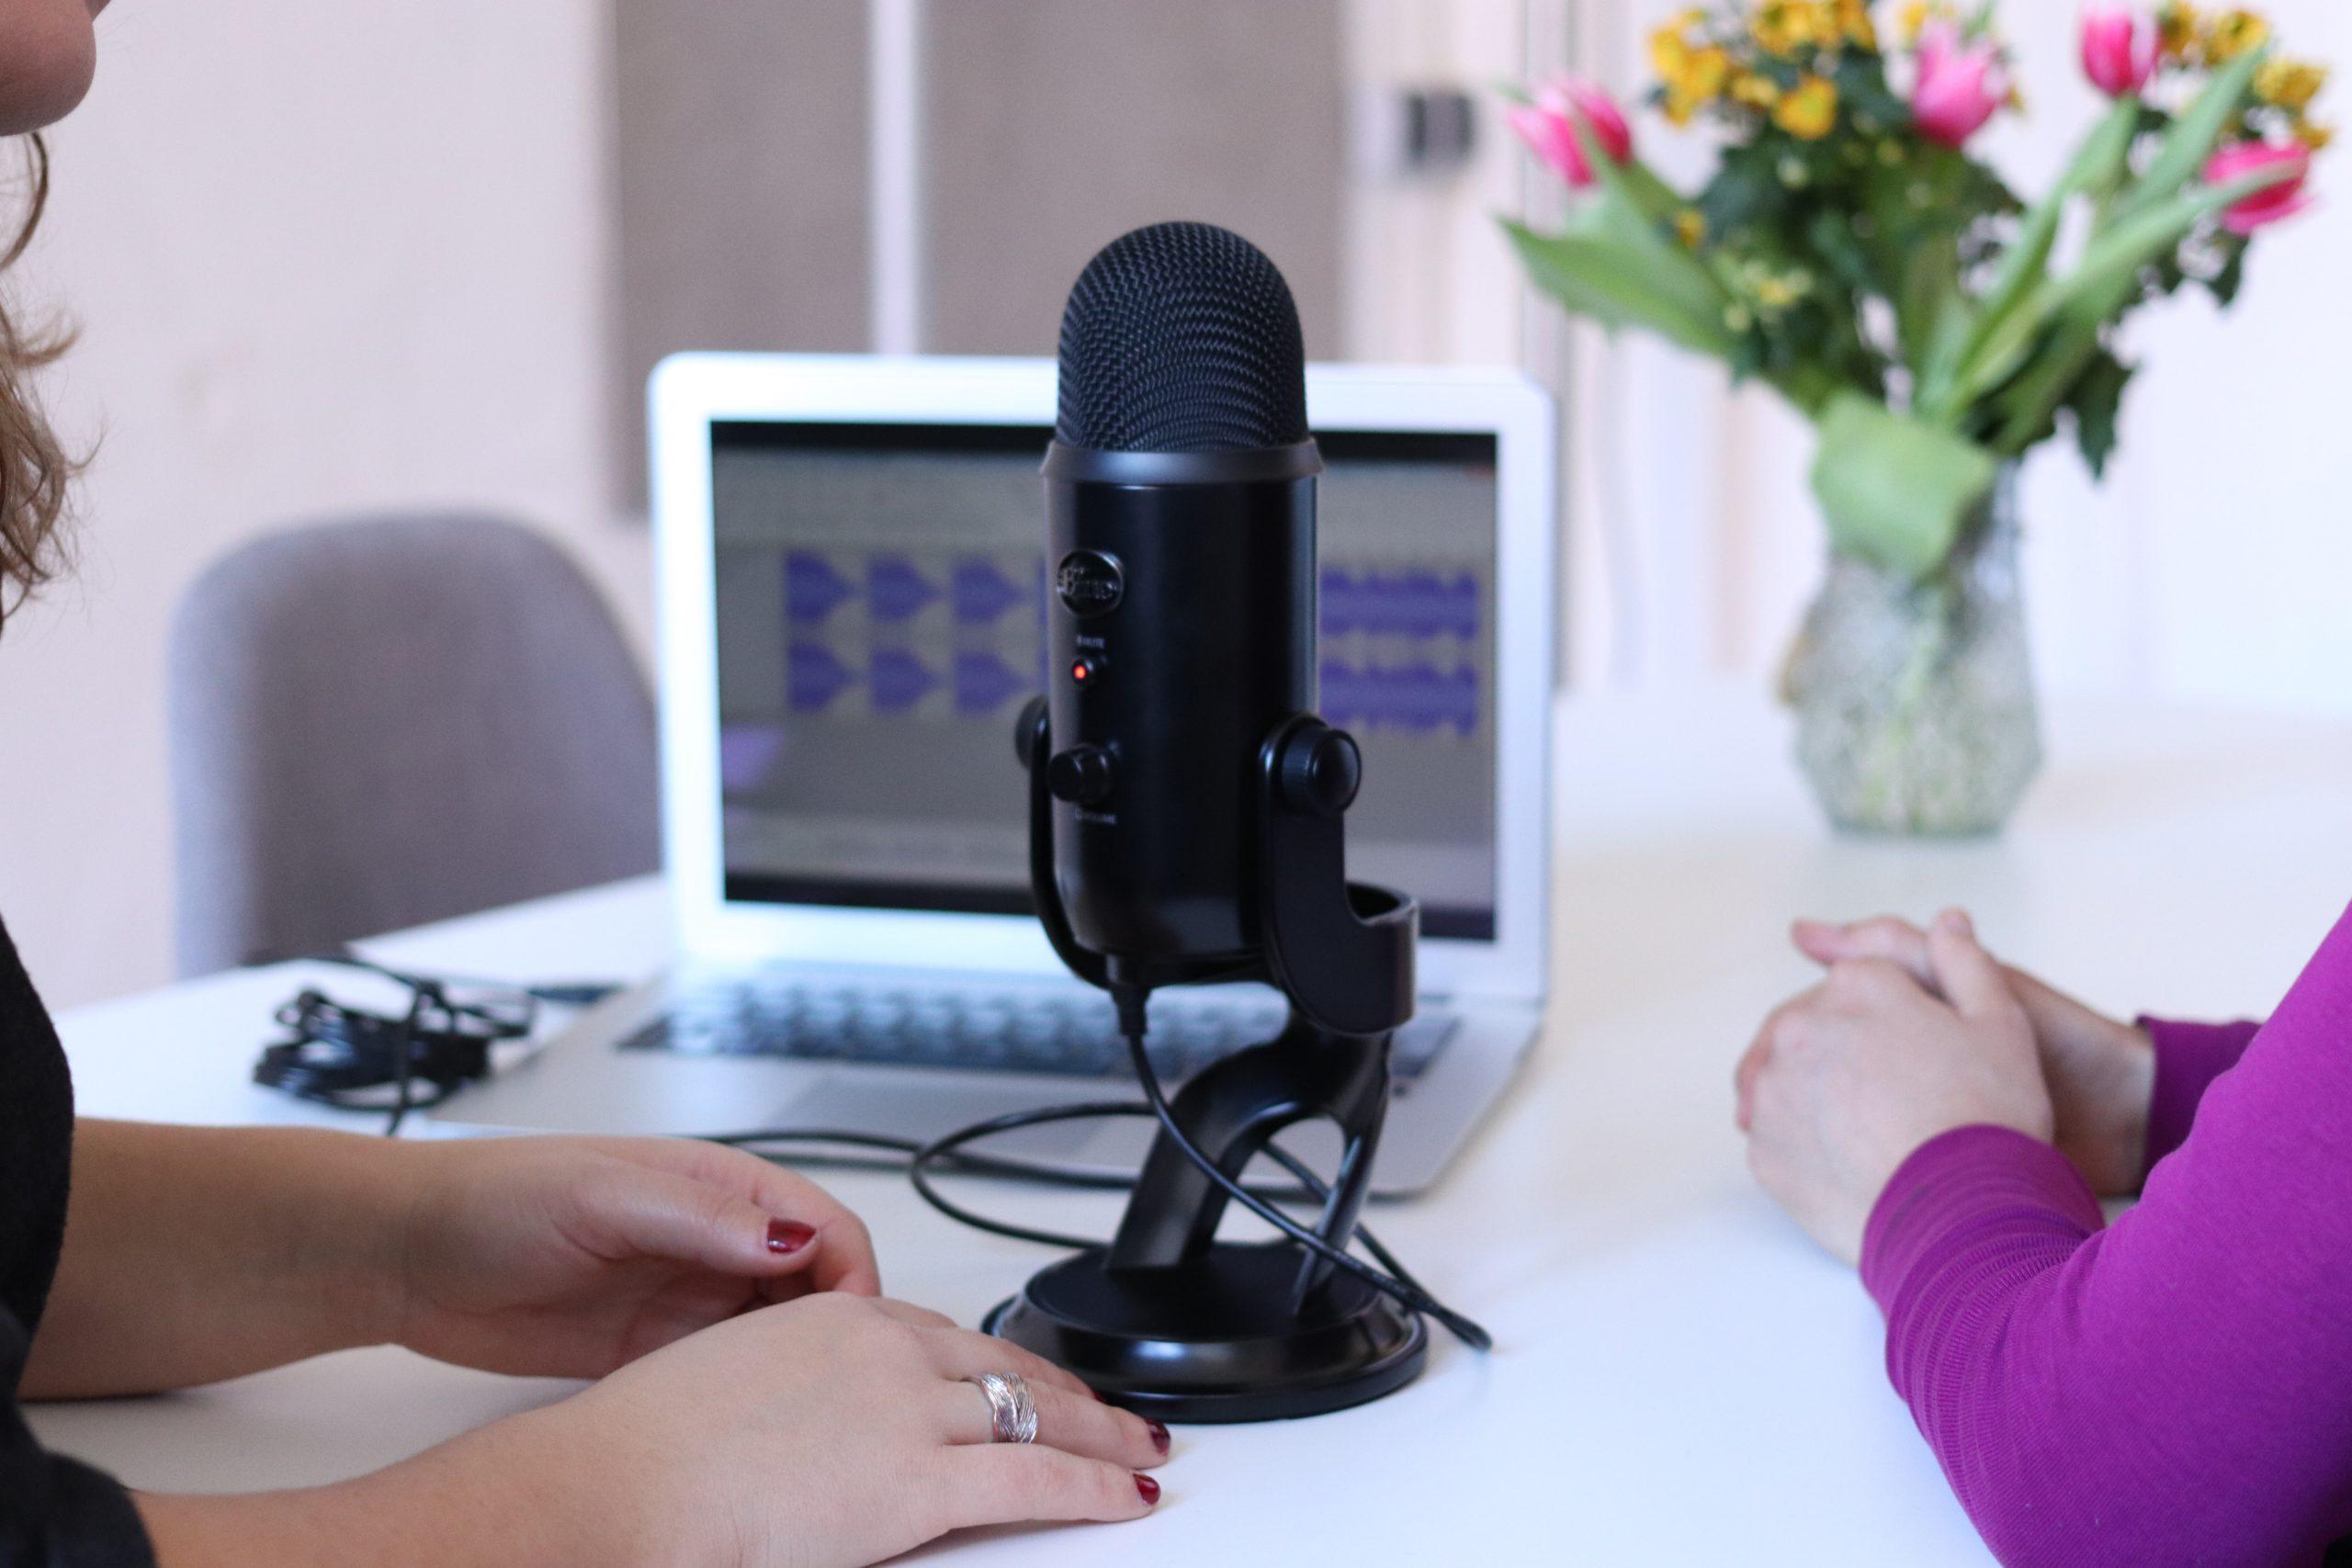 Let's talk about: Media-Podcasts für Lifestyle-Inspiration